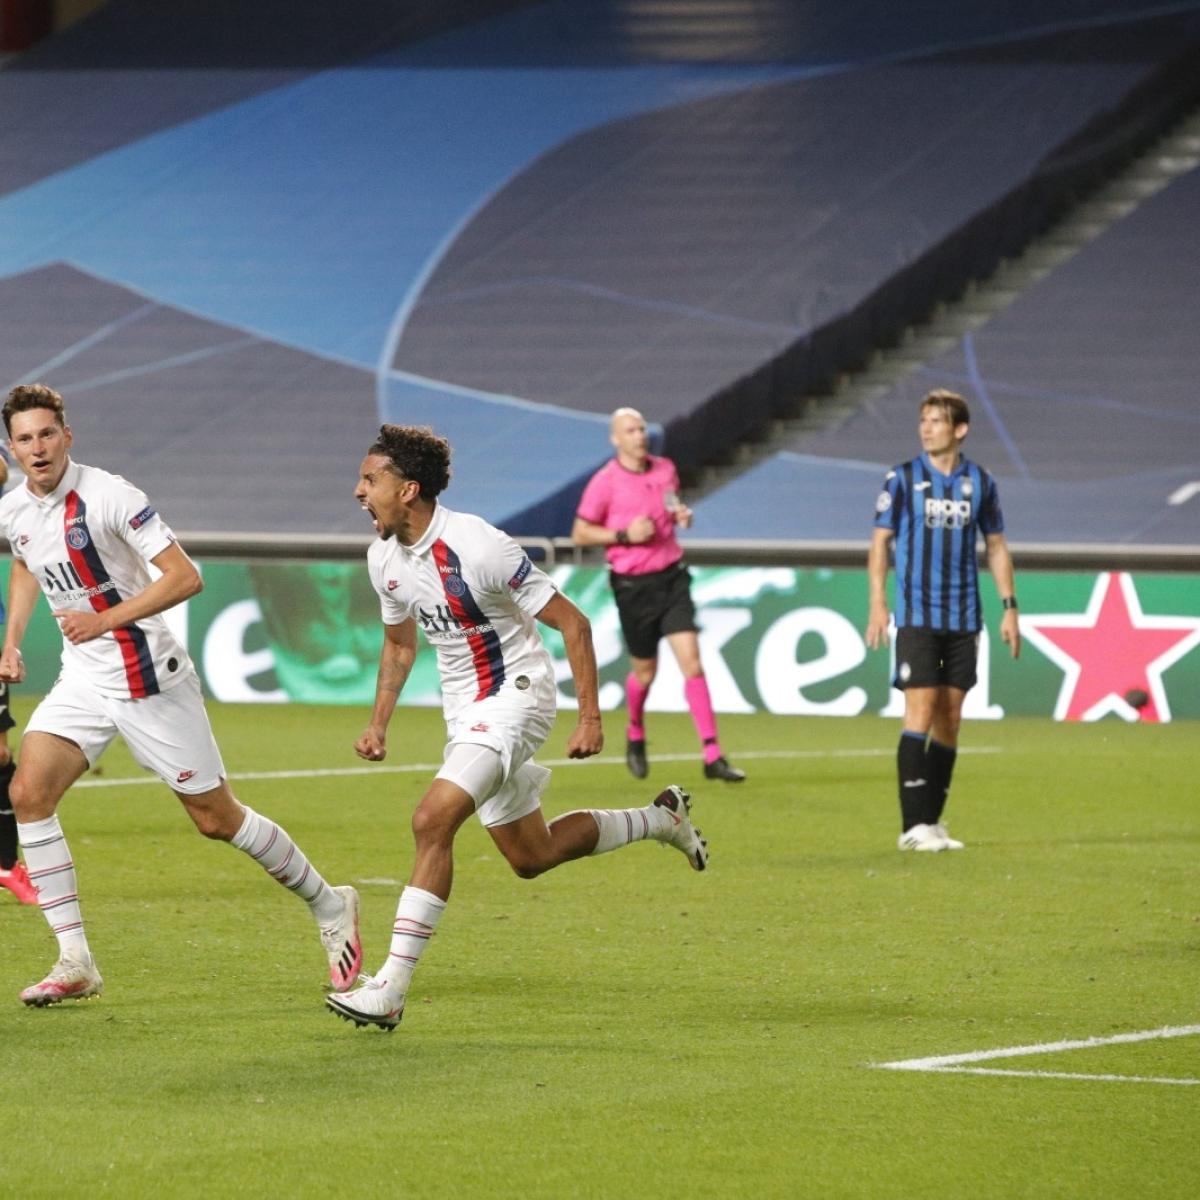 PSG secure 2-1 win over Atalanta to progress to Champions League semi-finals